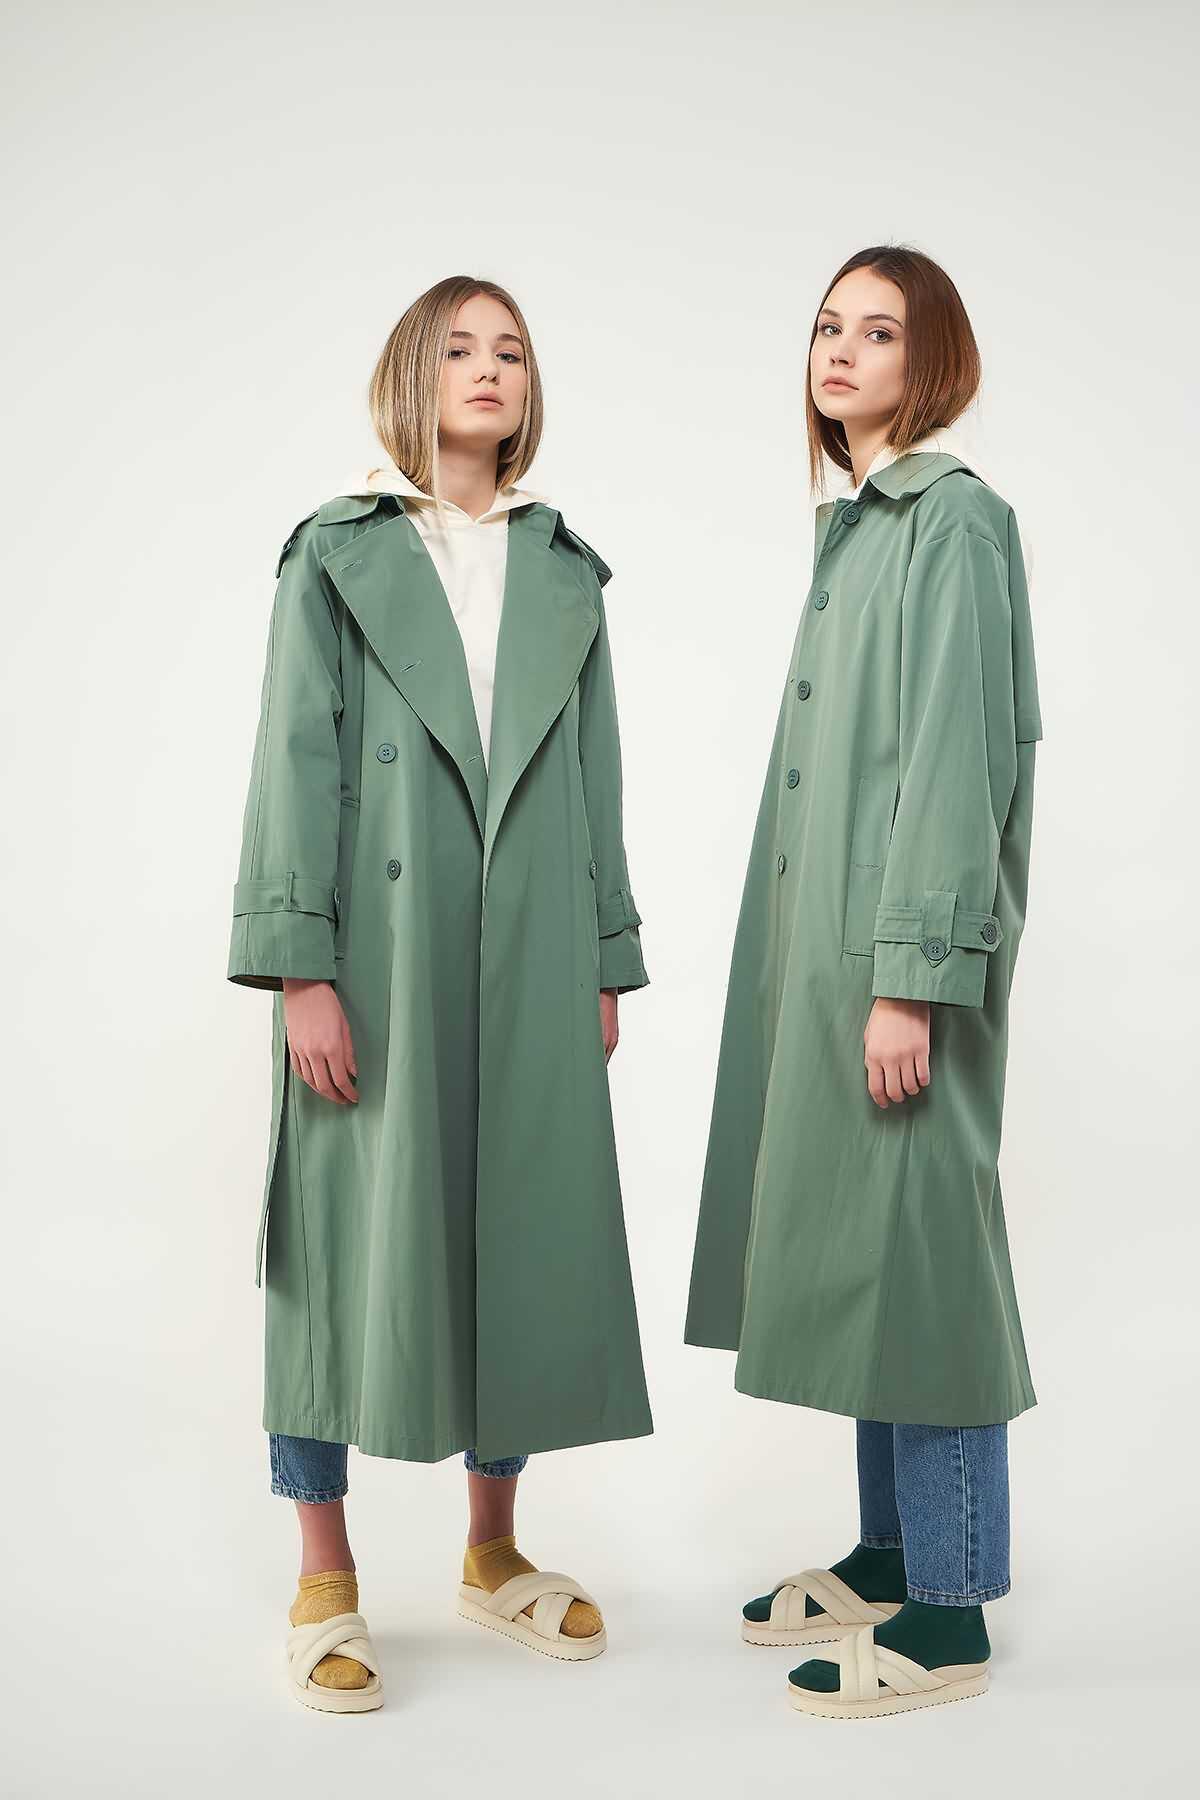 Mevra - Astarlı Trenchcoat Yeşil